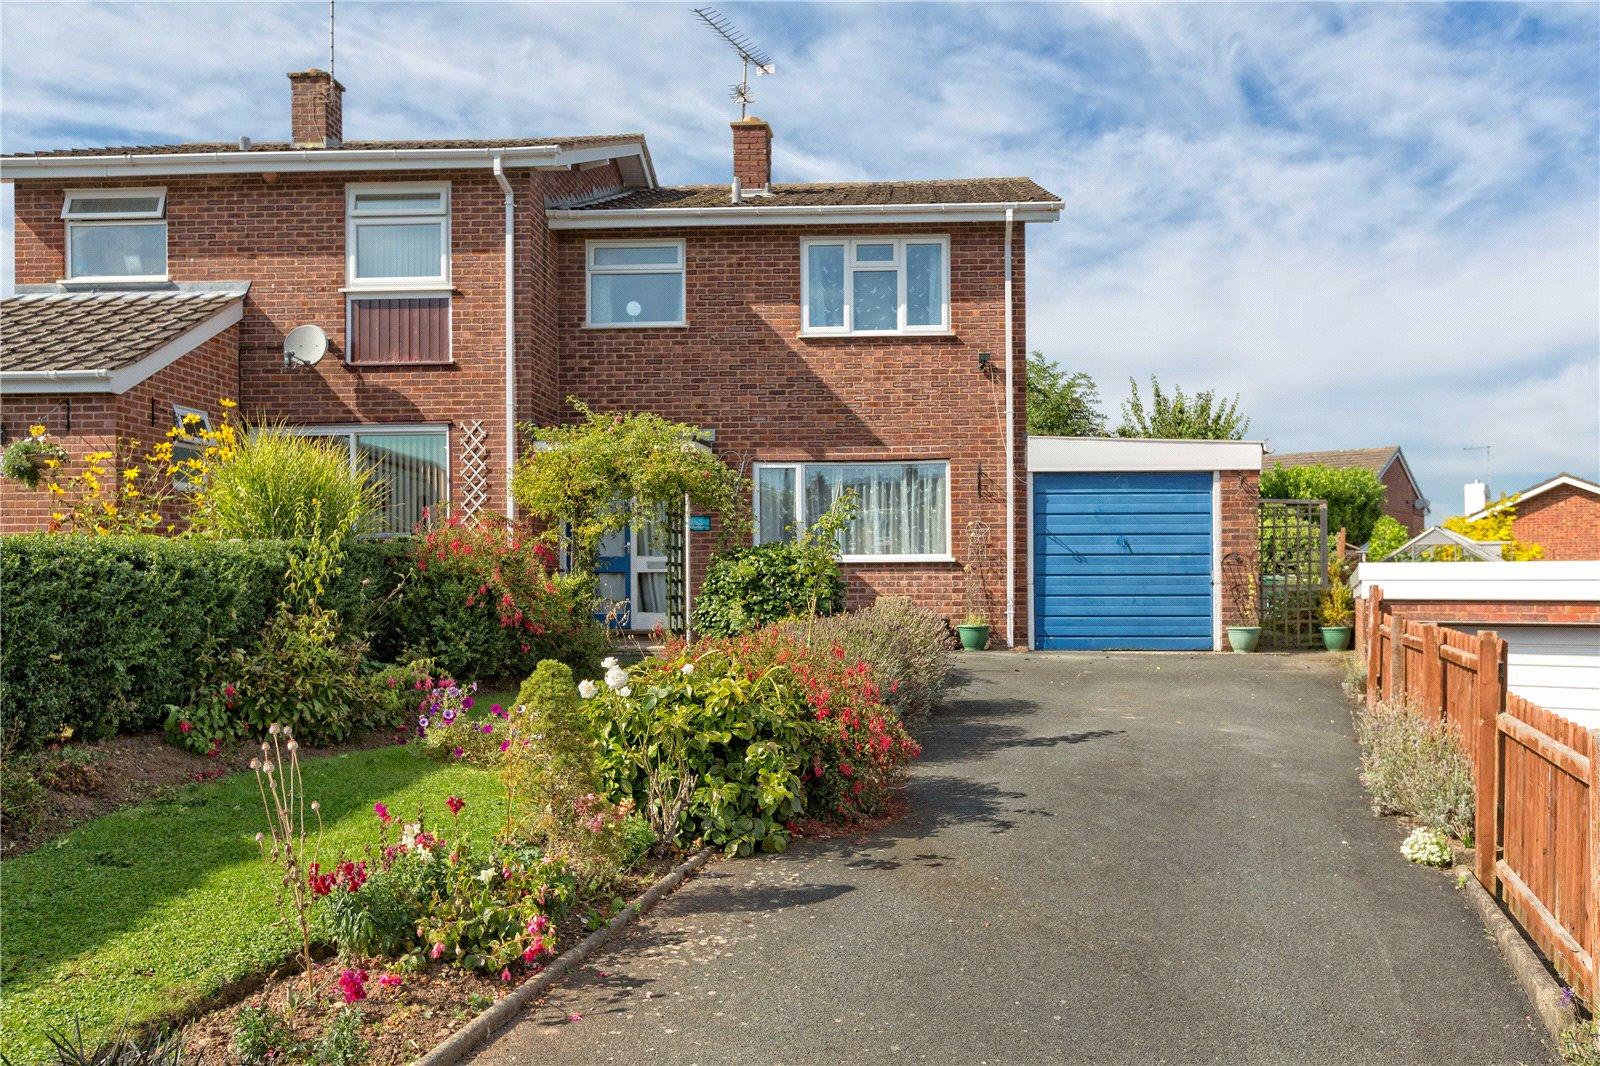 61 New Street, Ludlow, Shropshire, SY8